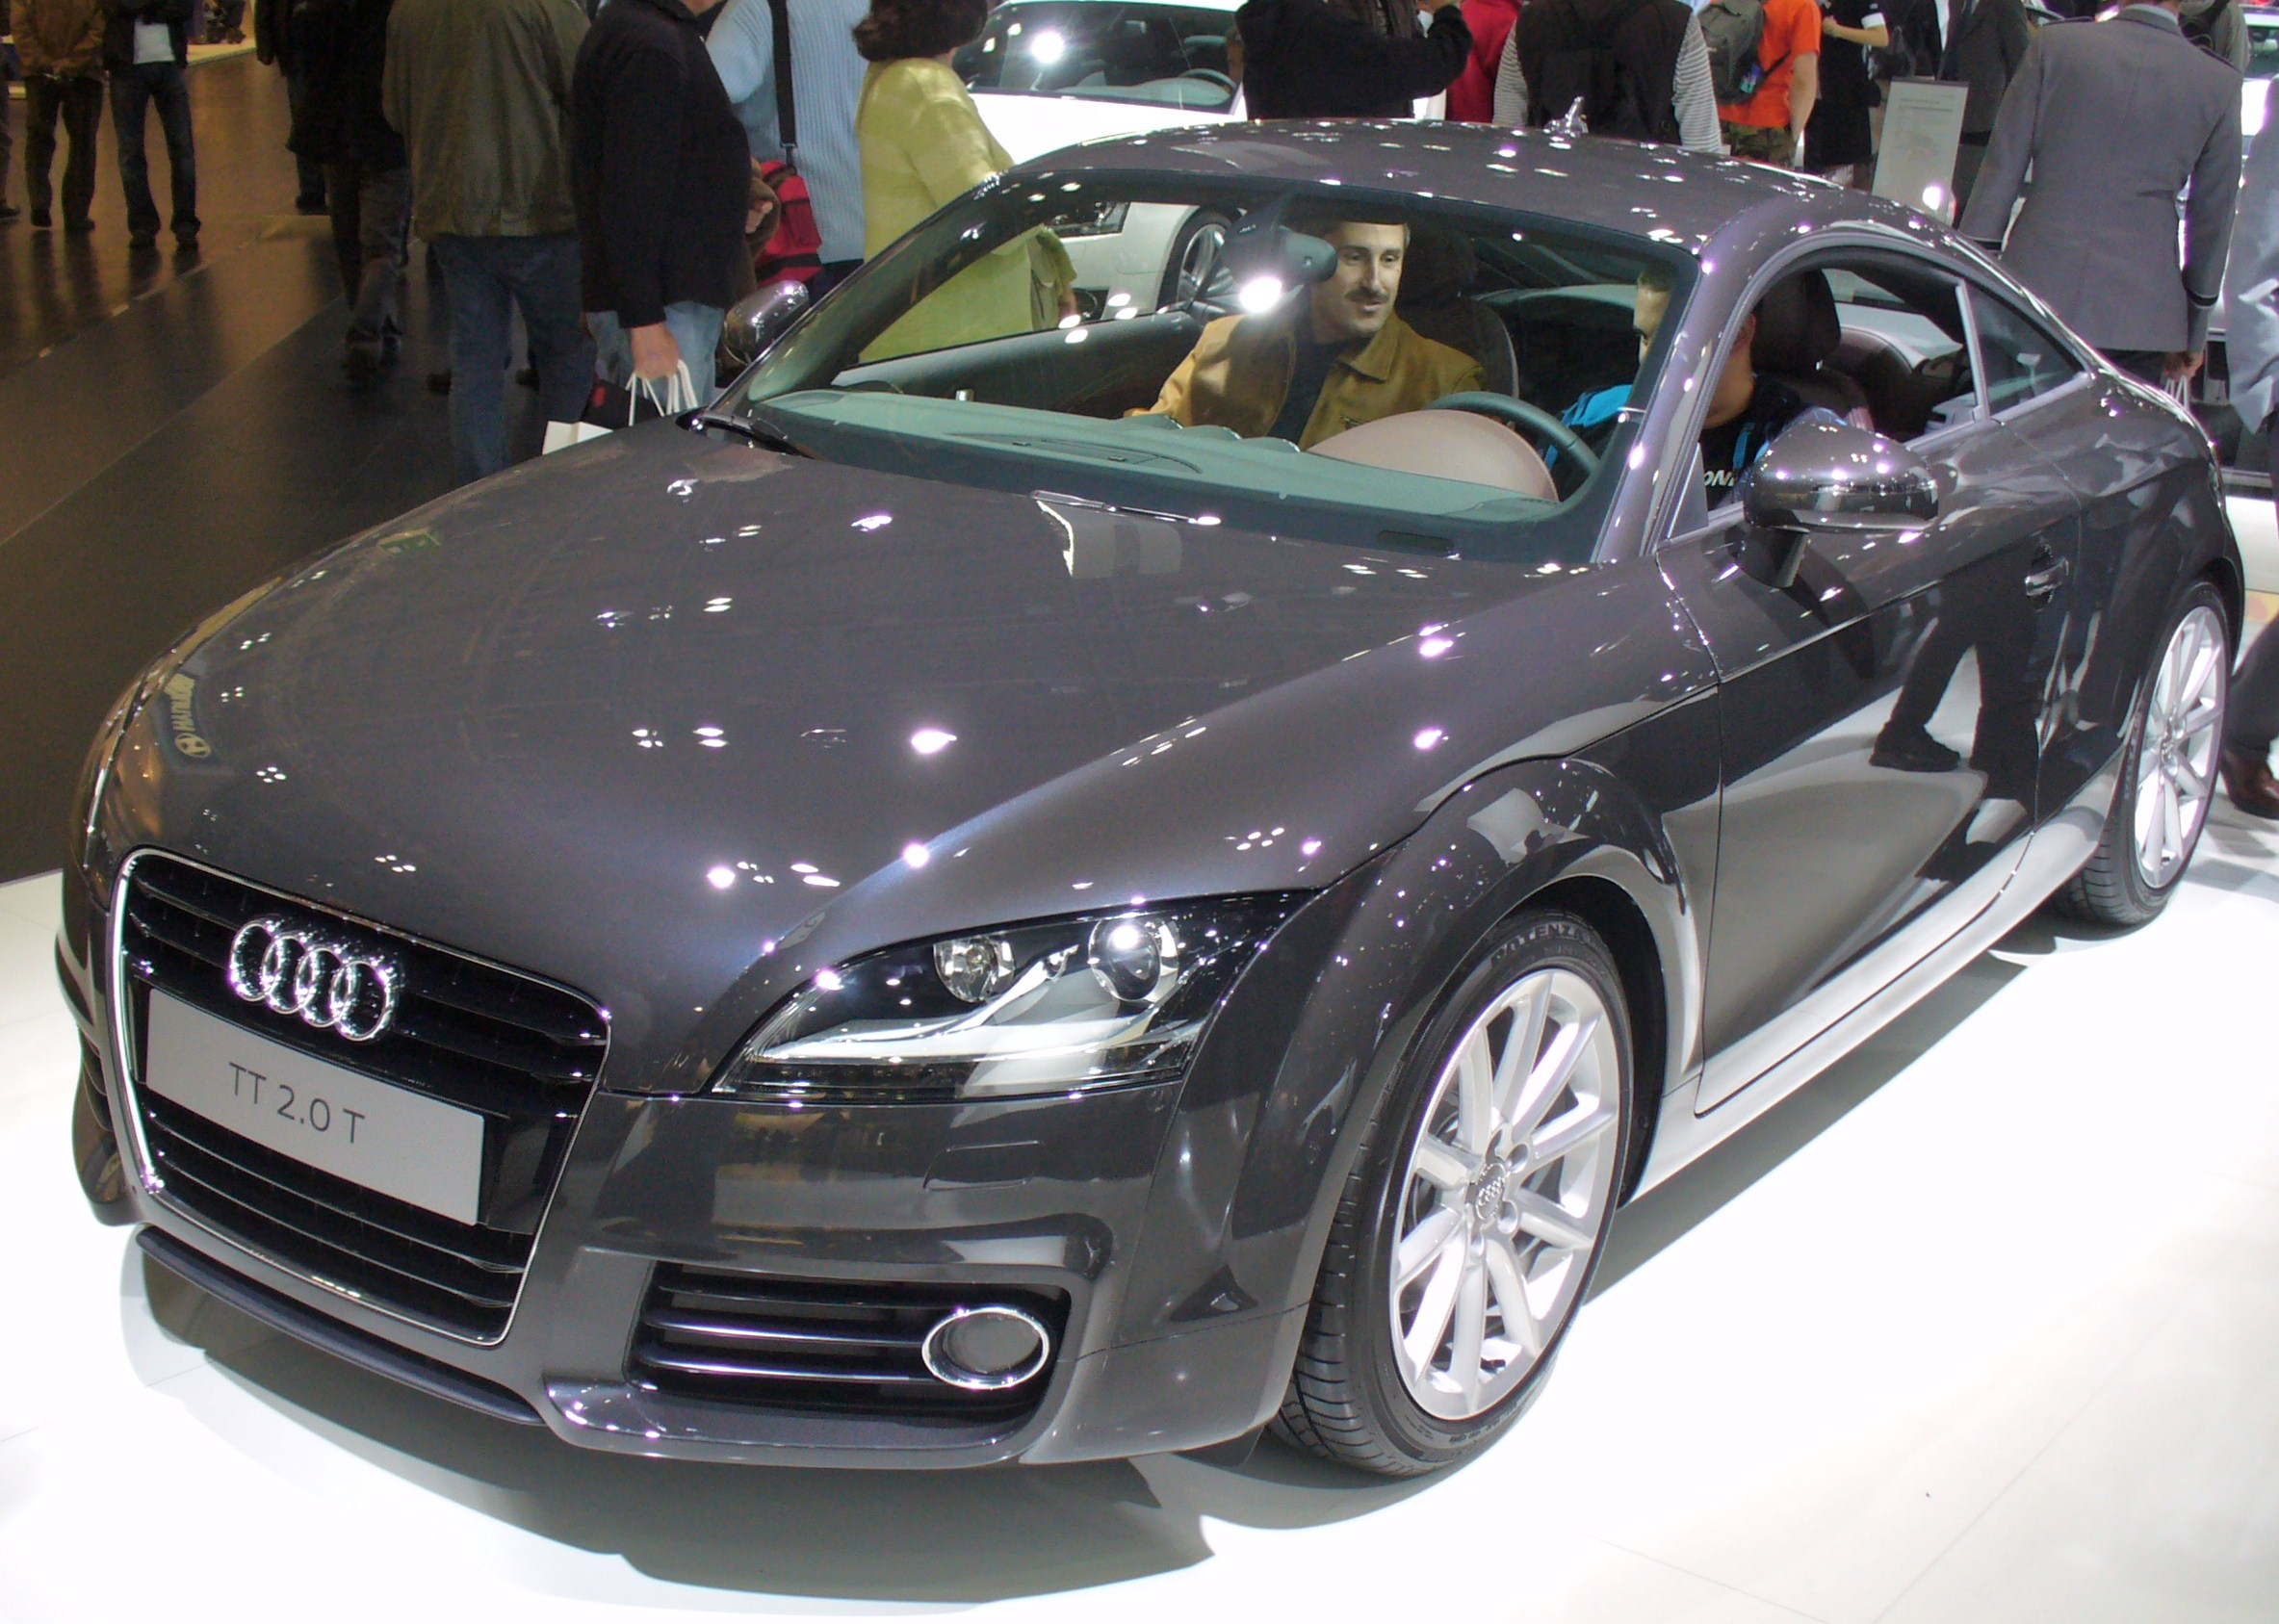 Audi 2 0 T >> File Audi Tt 2 0 T Facelift Jpg Wikimedia Commons